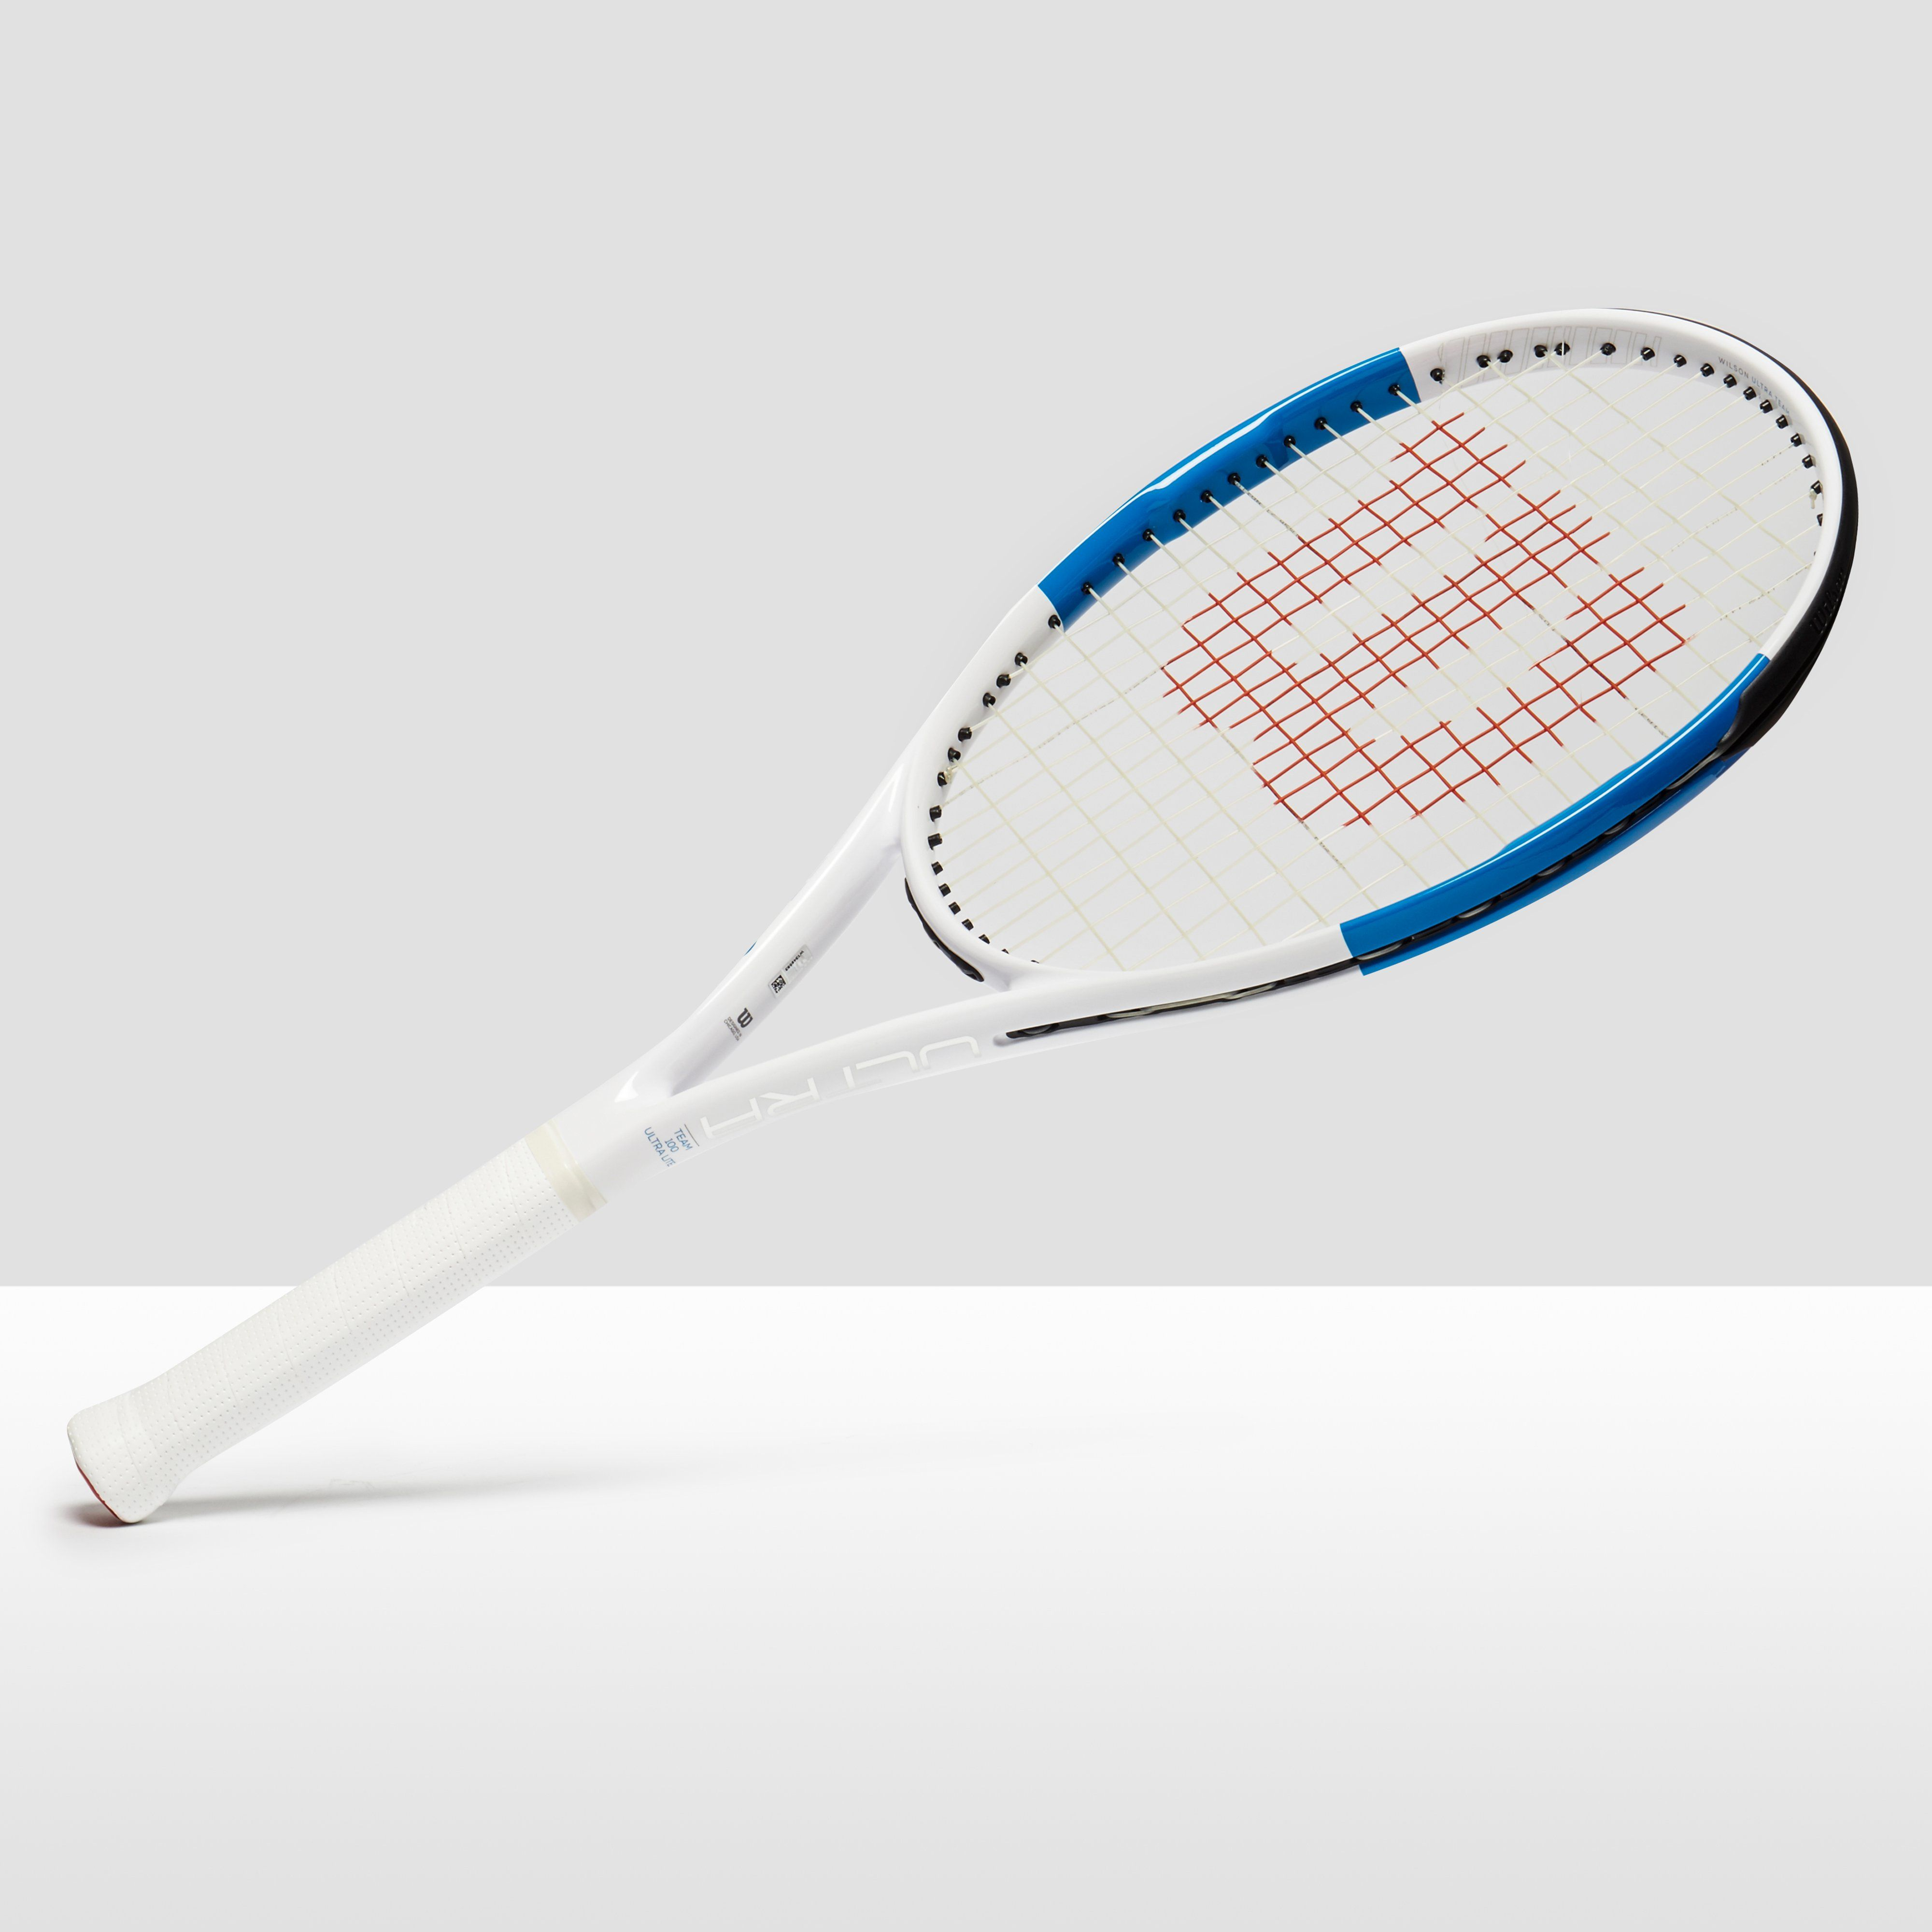 Wilson Ultra 100UL Team Tennis Racket